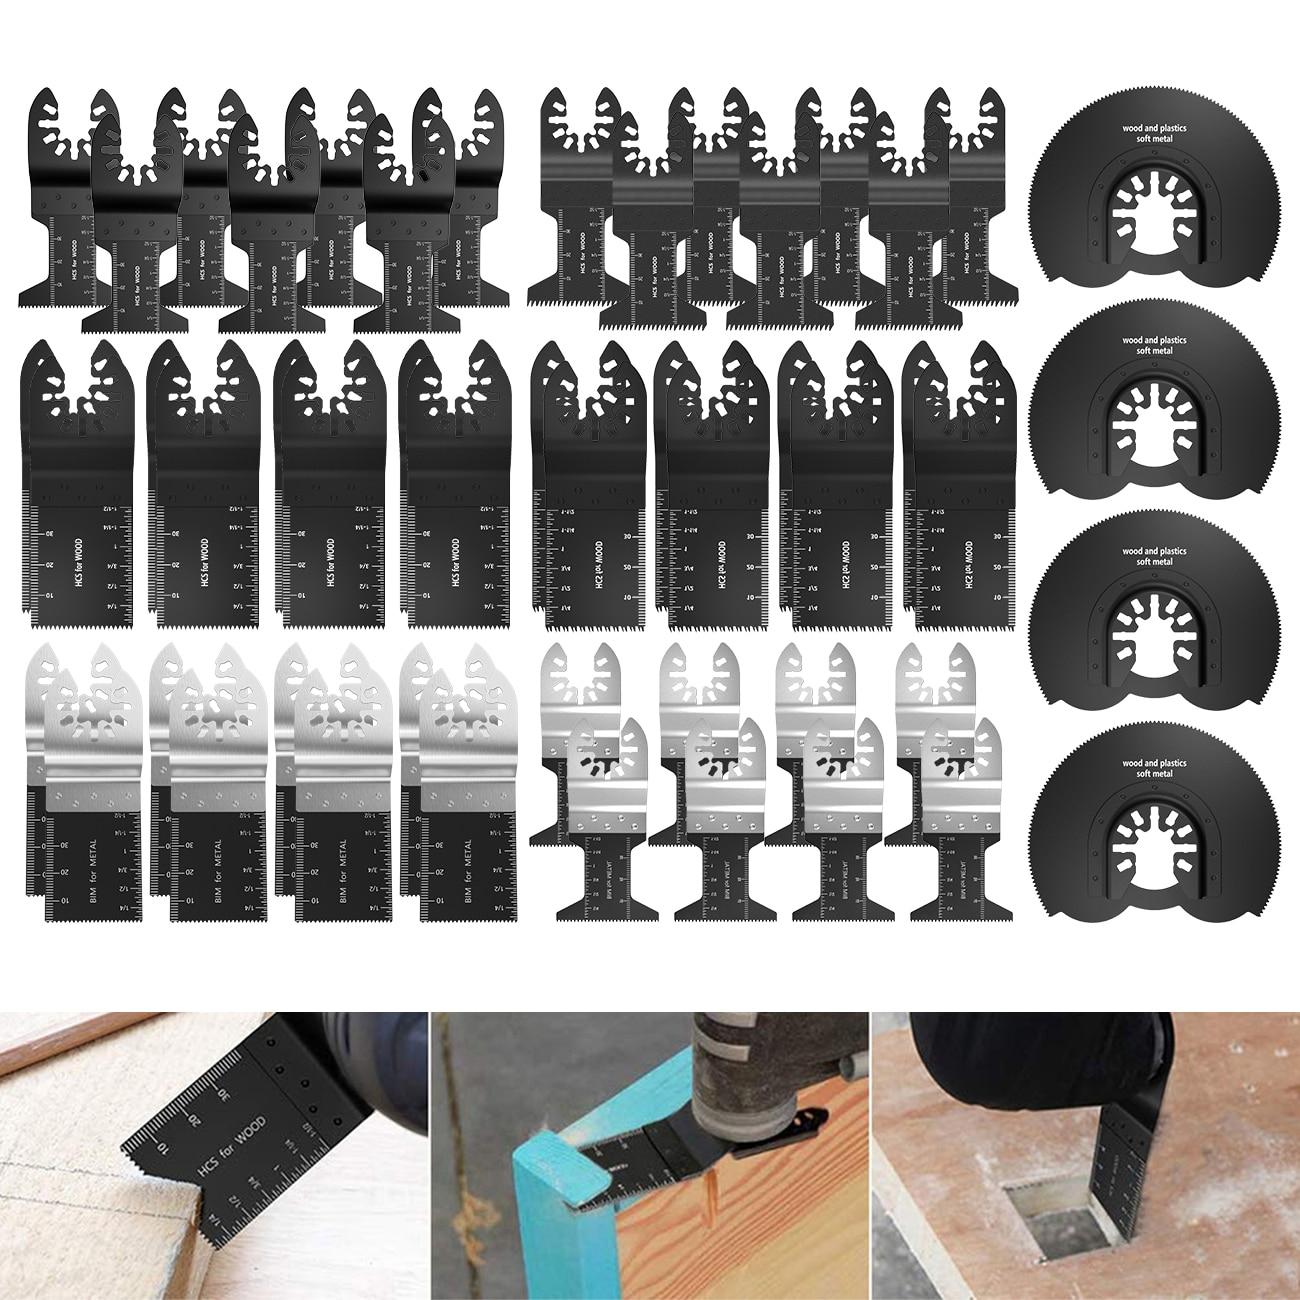 50Pcs Oscillating Multi Tool Saw Blade For Fein Bosch Multi Master Makita Cutting Wood Tools For Dremel Blade Power Blades